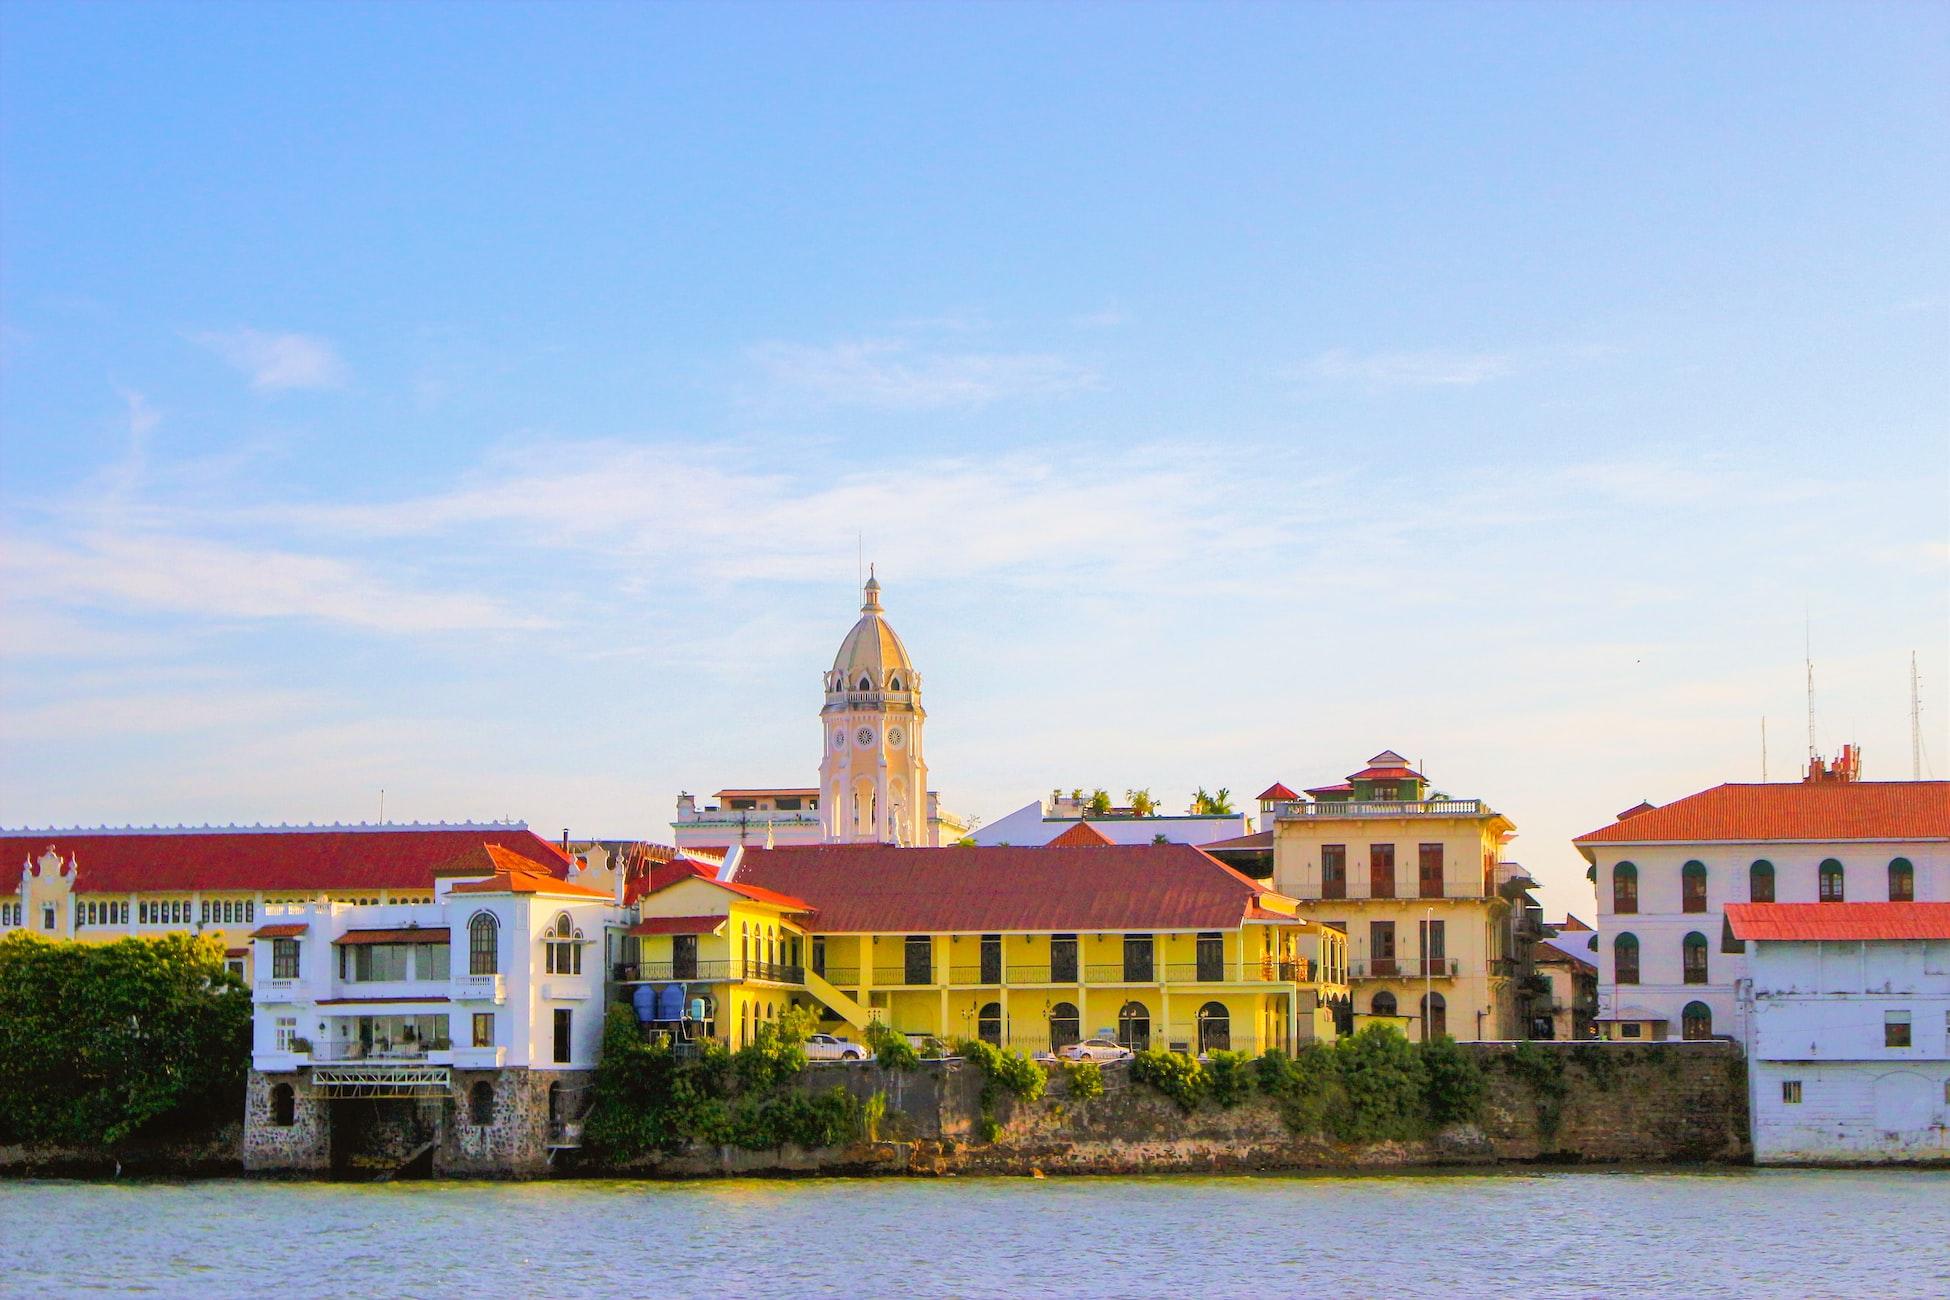 colorful buildings in panama city